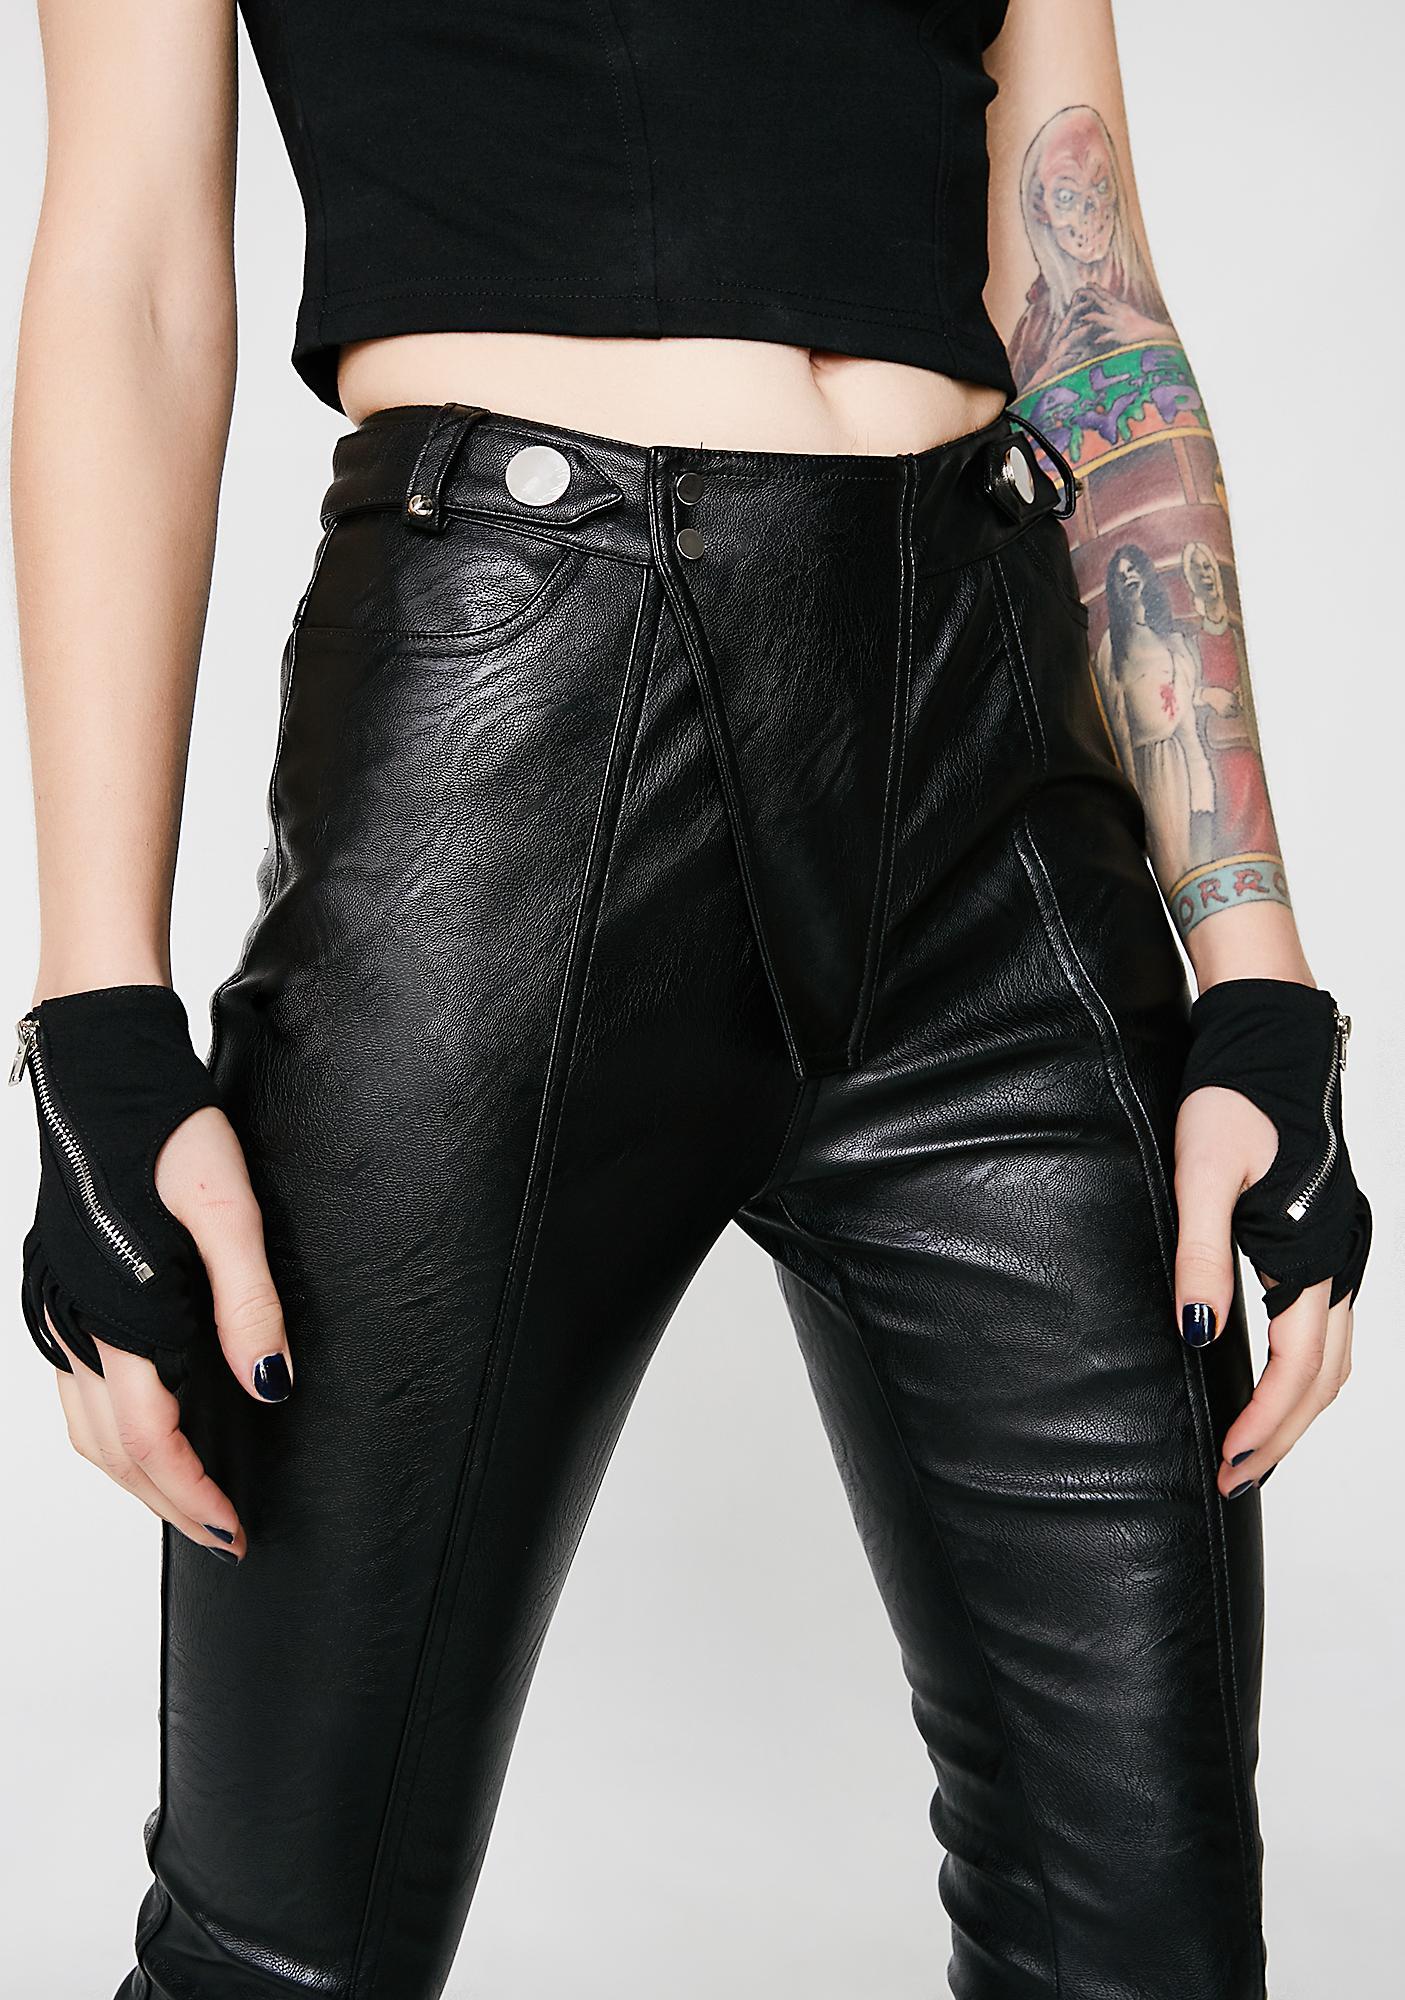 Punk Rave Black Leather Pants